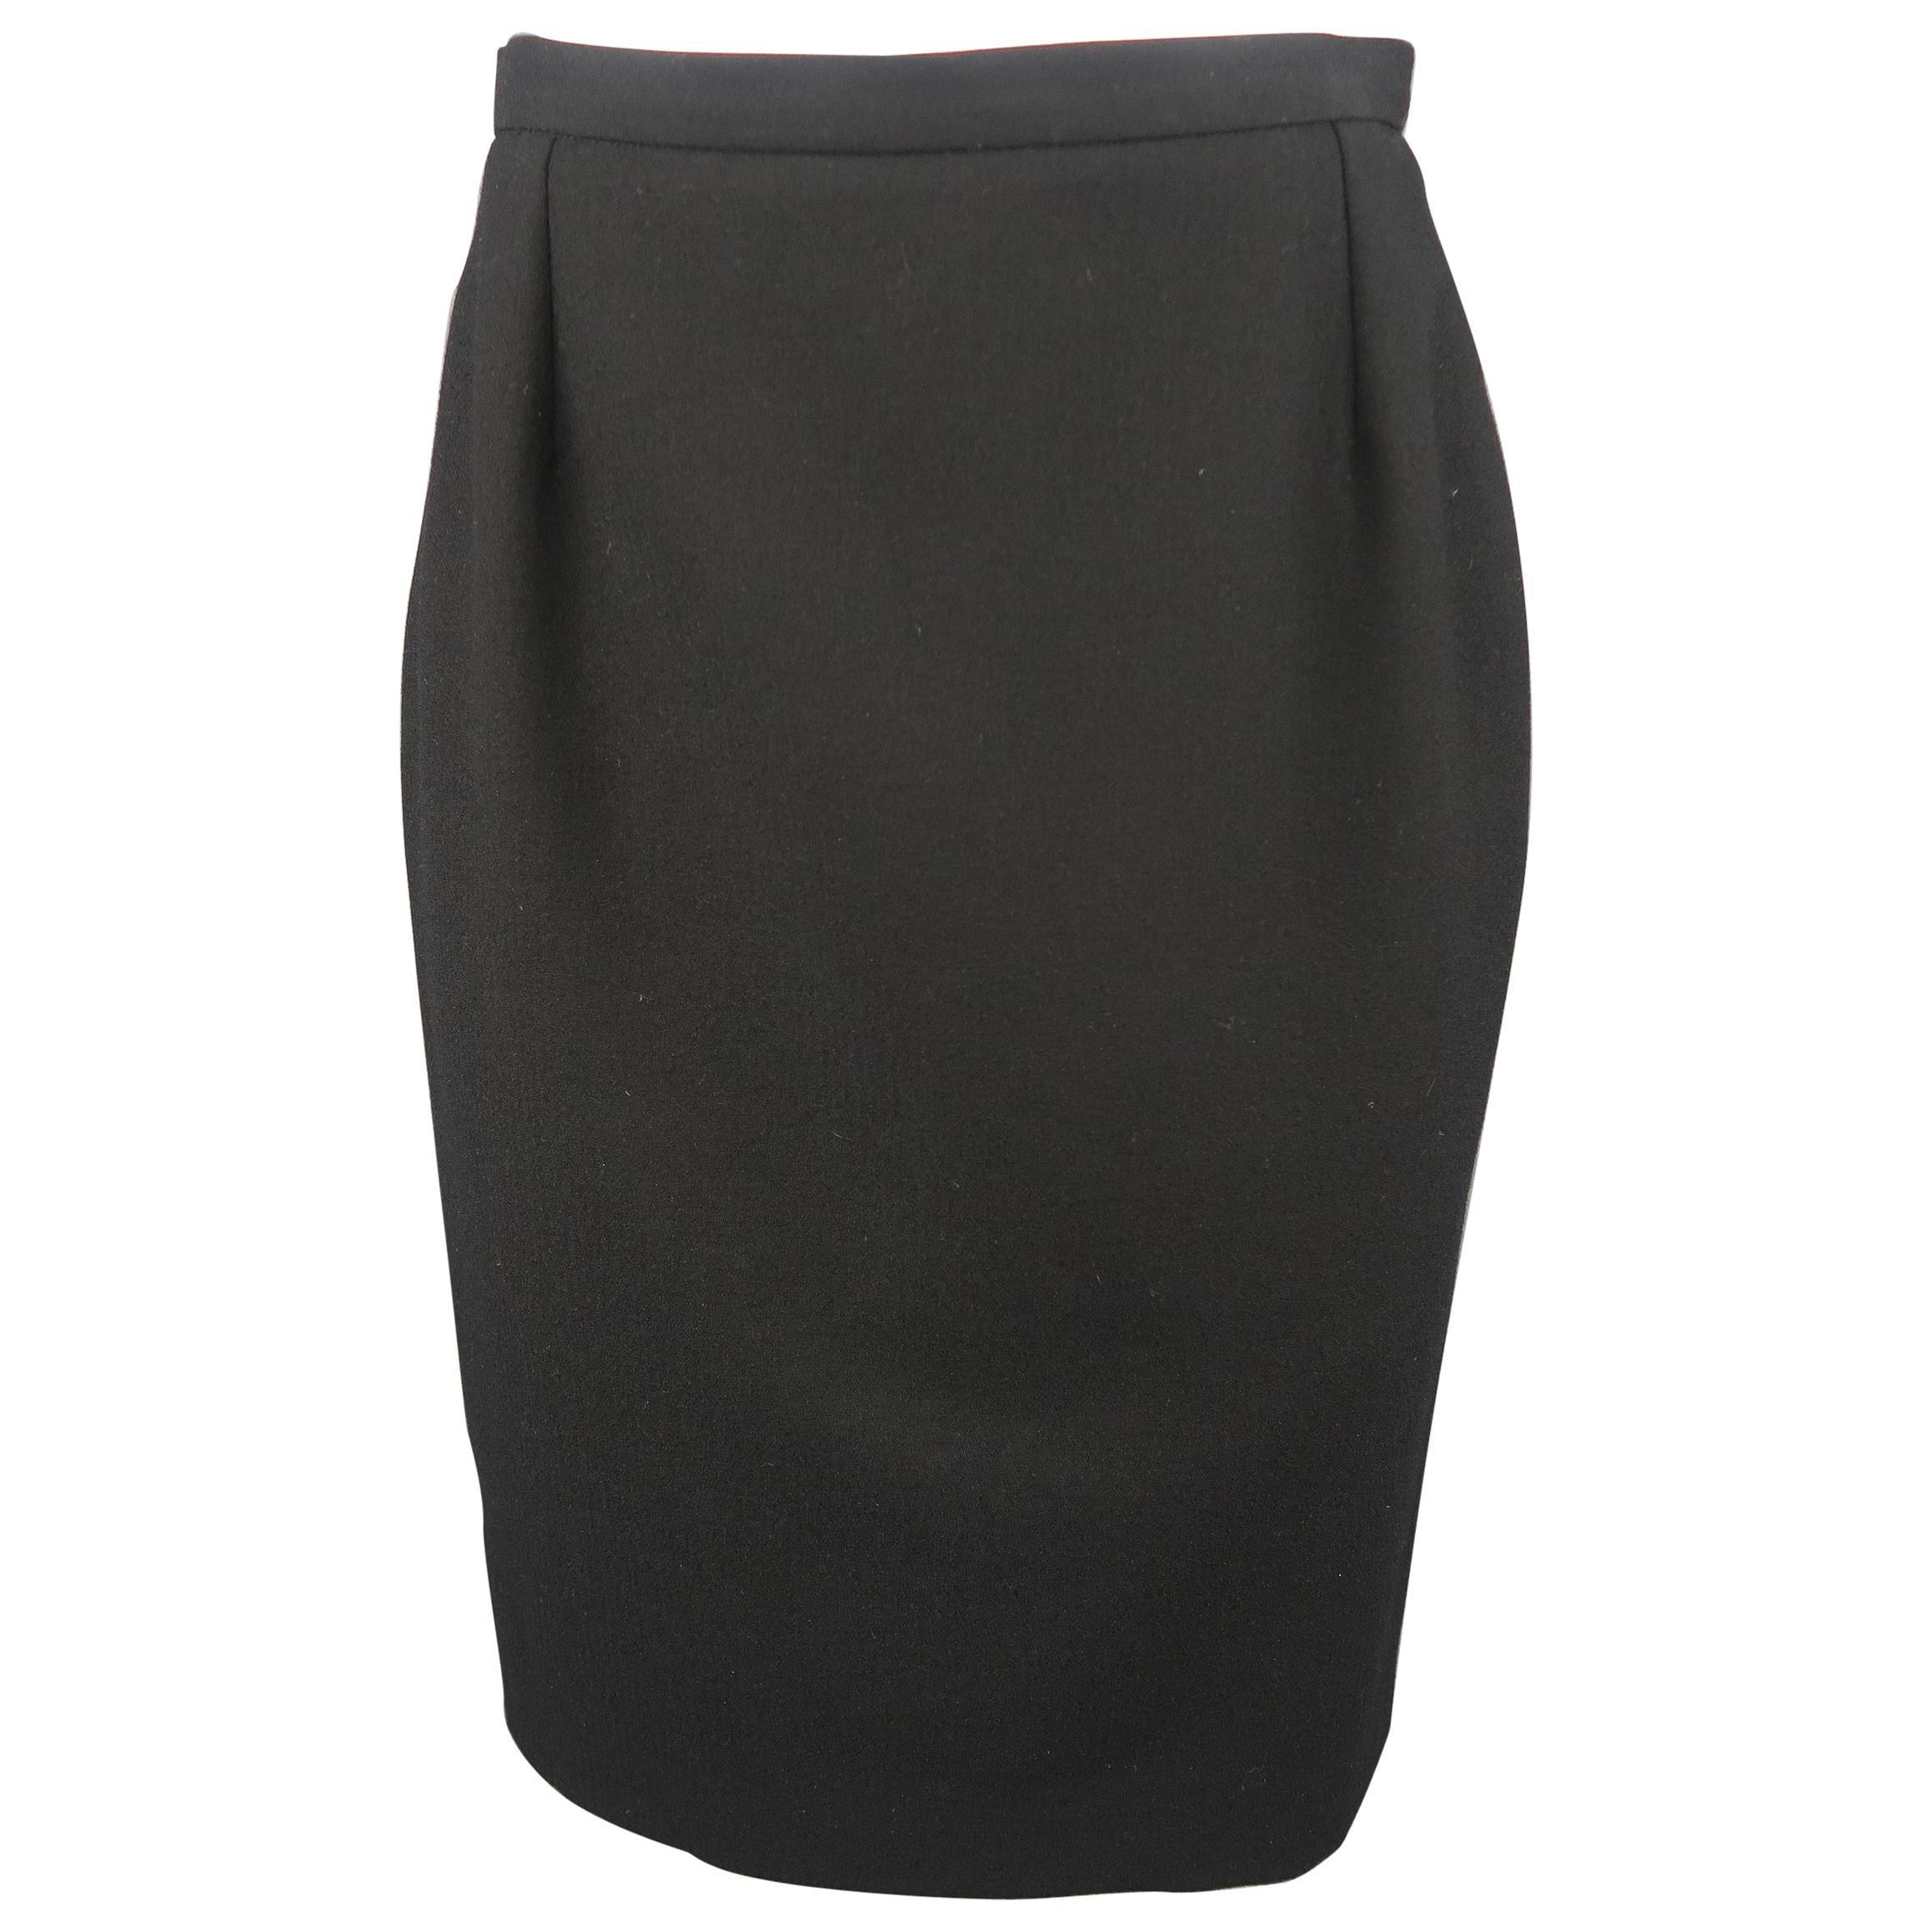 Yves Saint Laurent Vintage Black Wool Classic Pencil Skirt